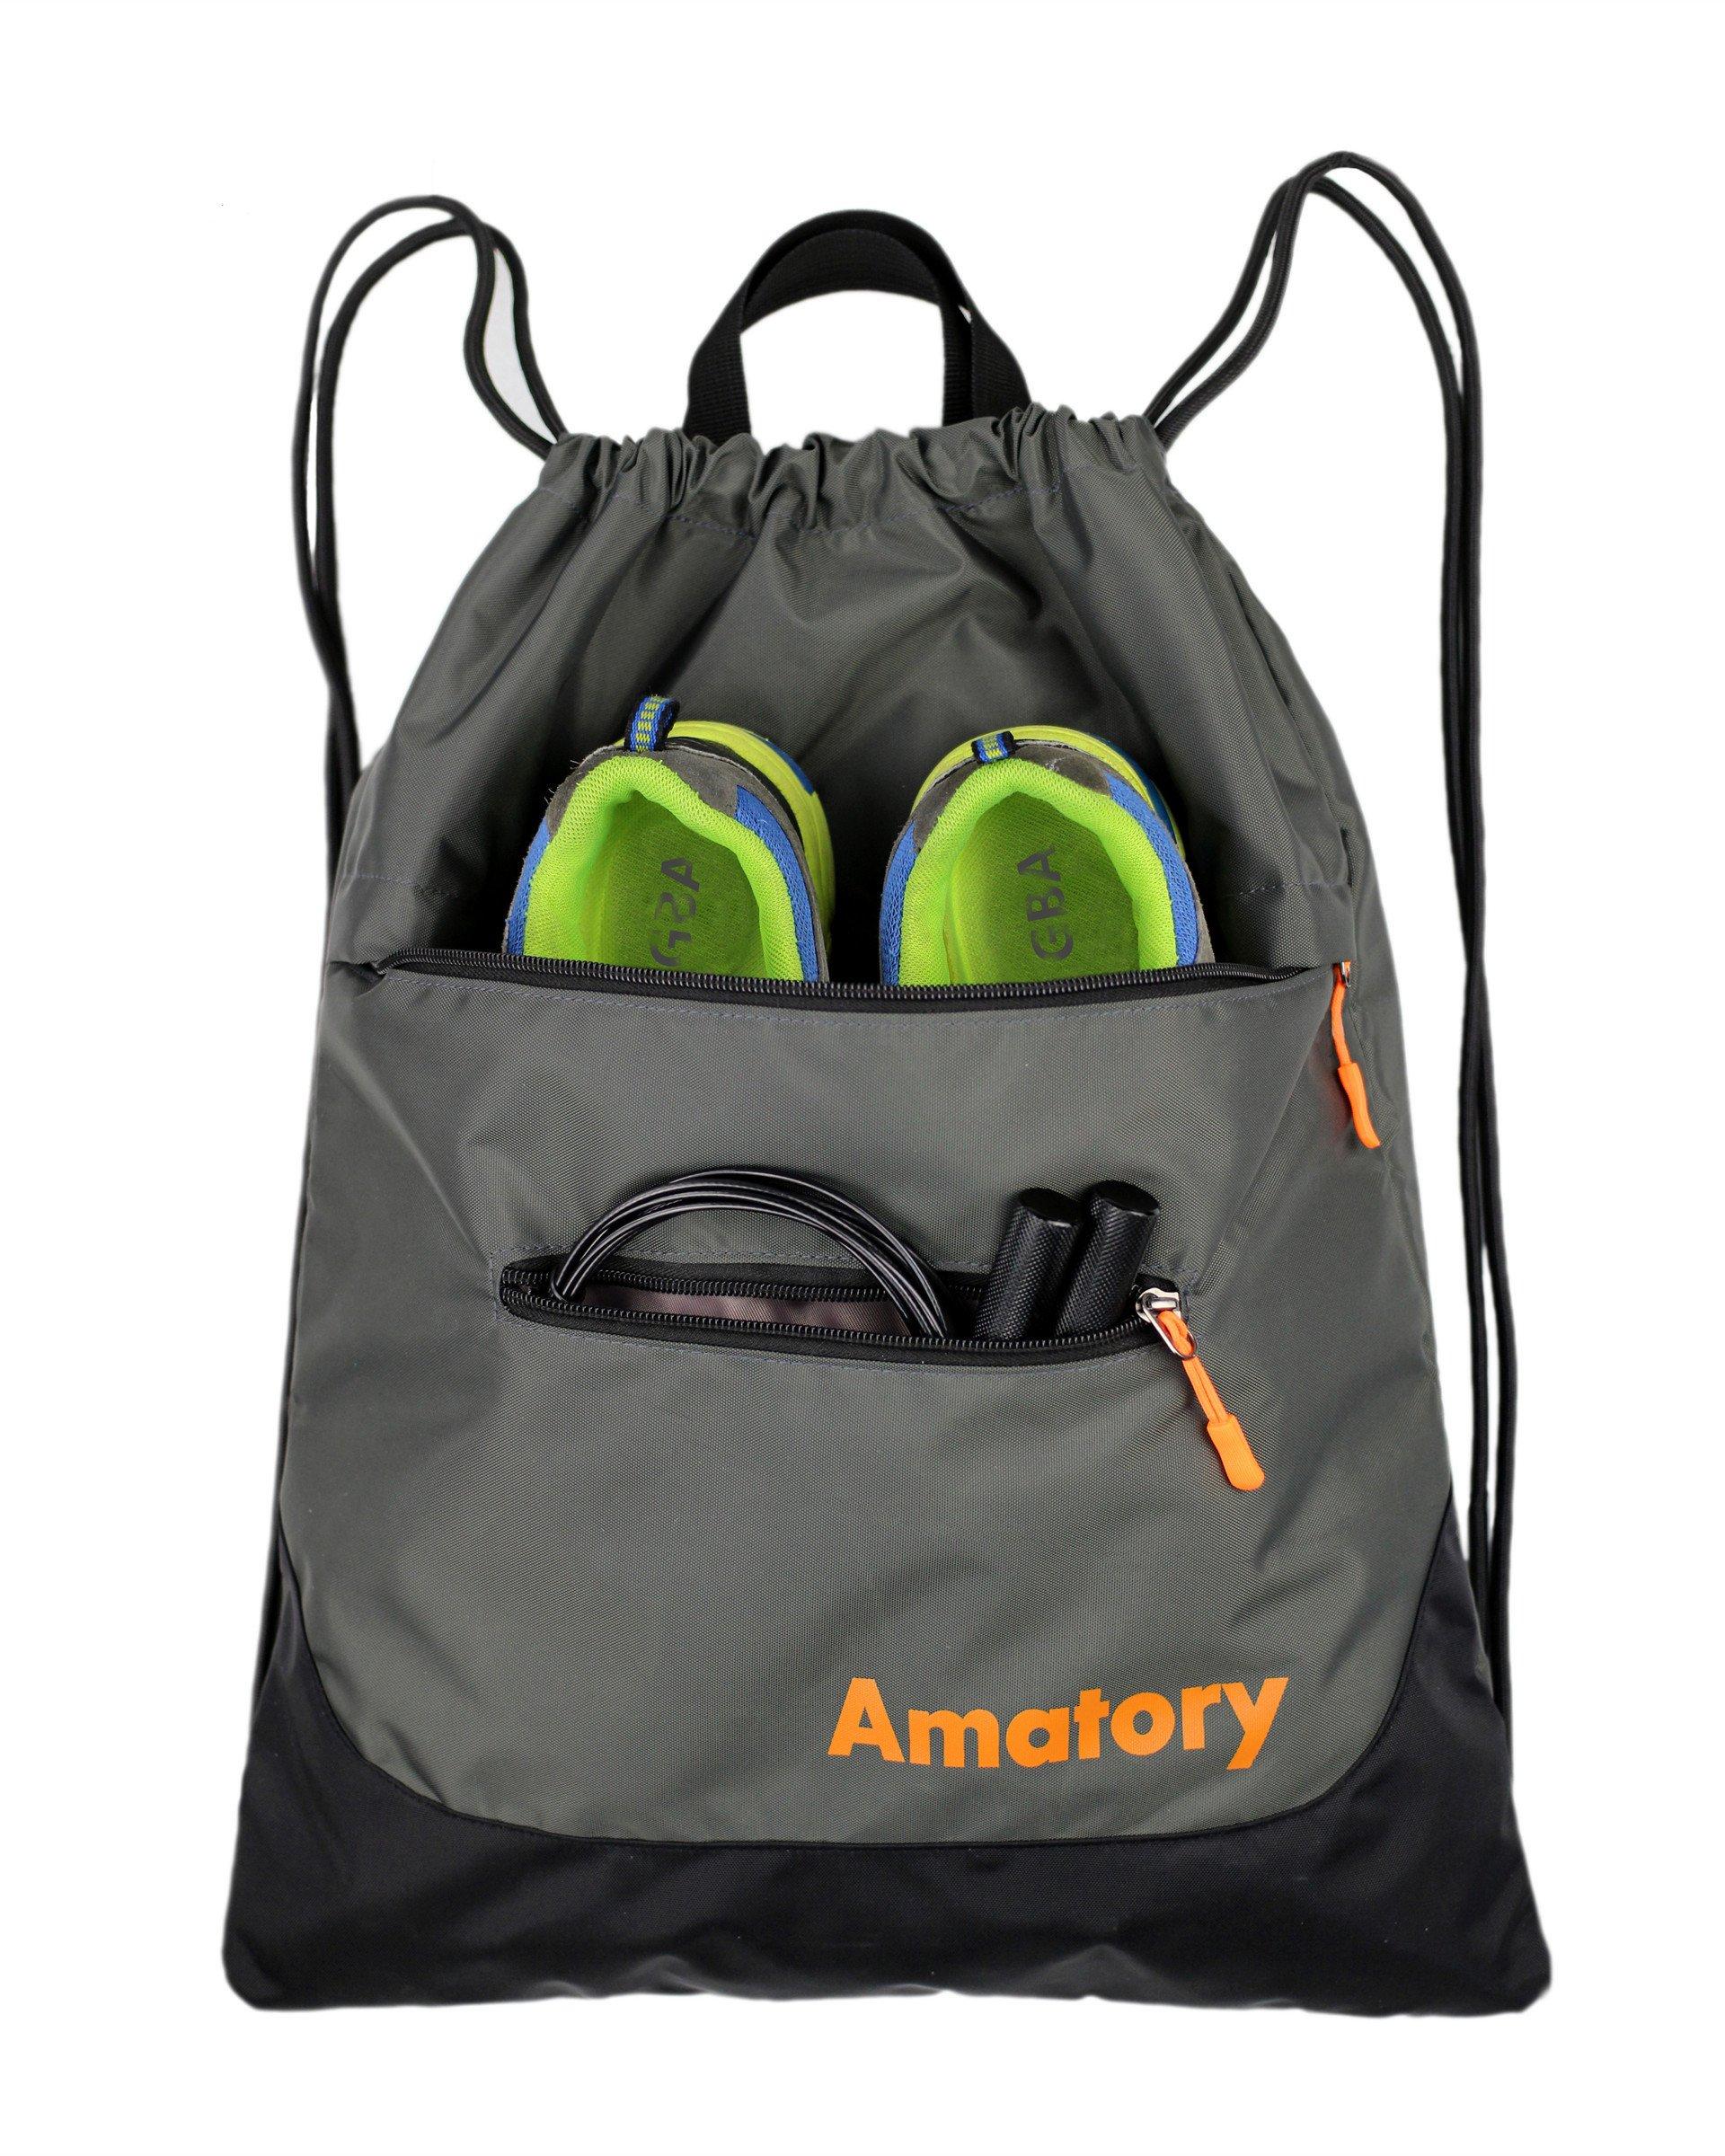 Drawstring Backpack Sports Gym String Bag Cinch Sack Gymsack Sackpack Waterproof (Gray)